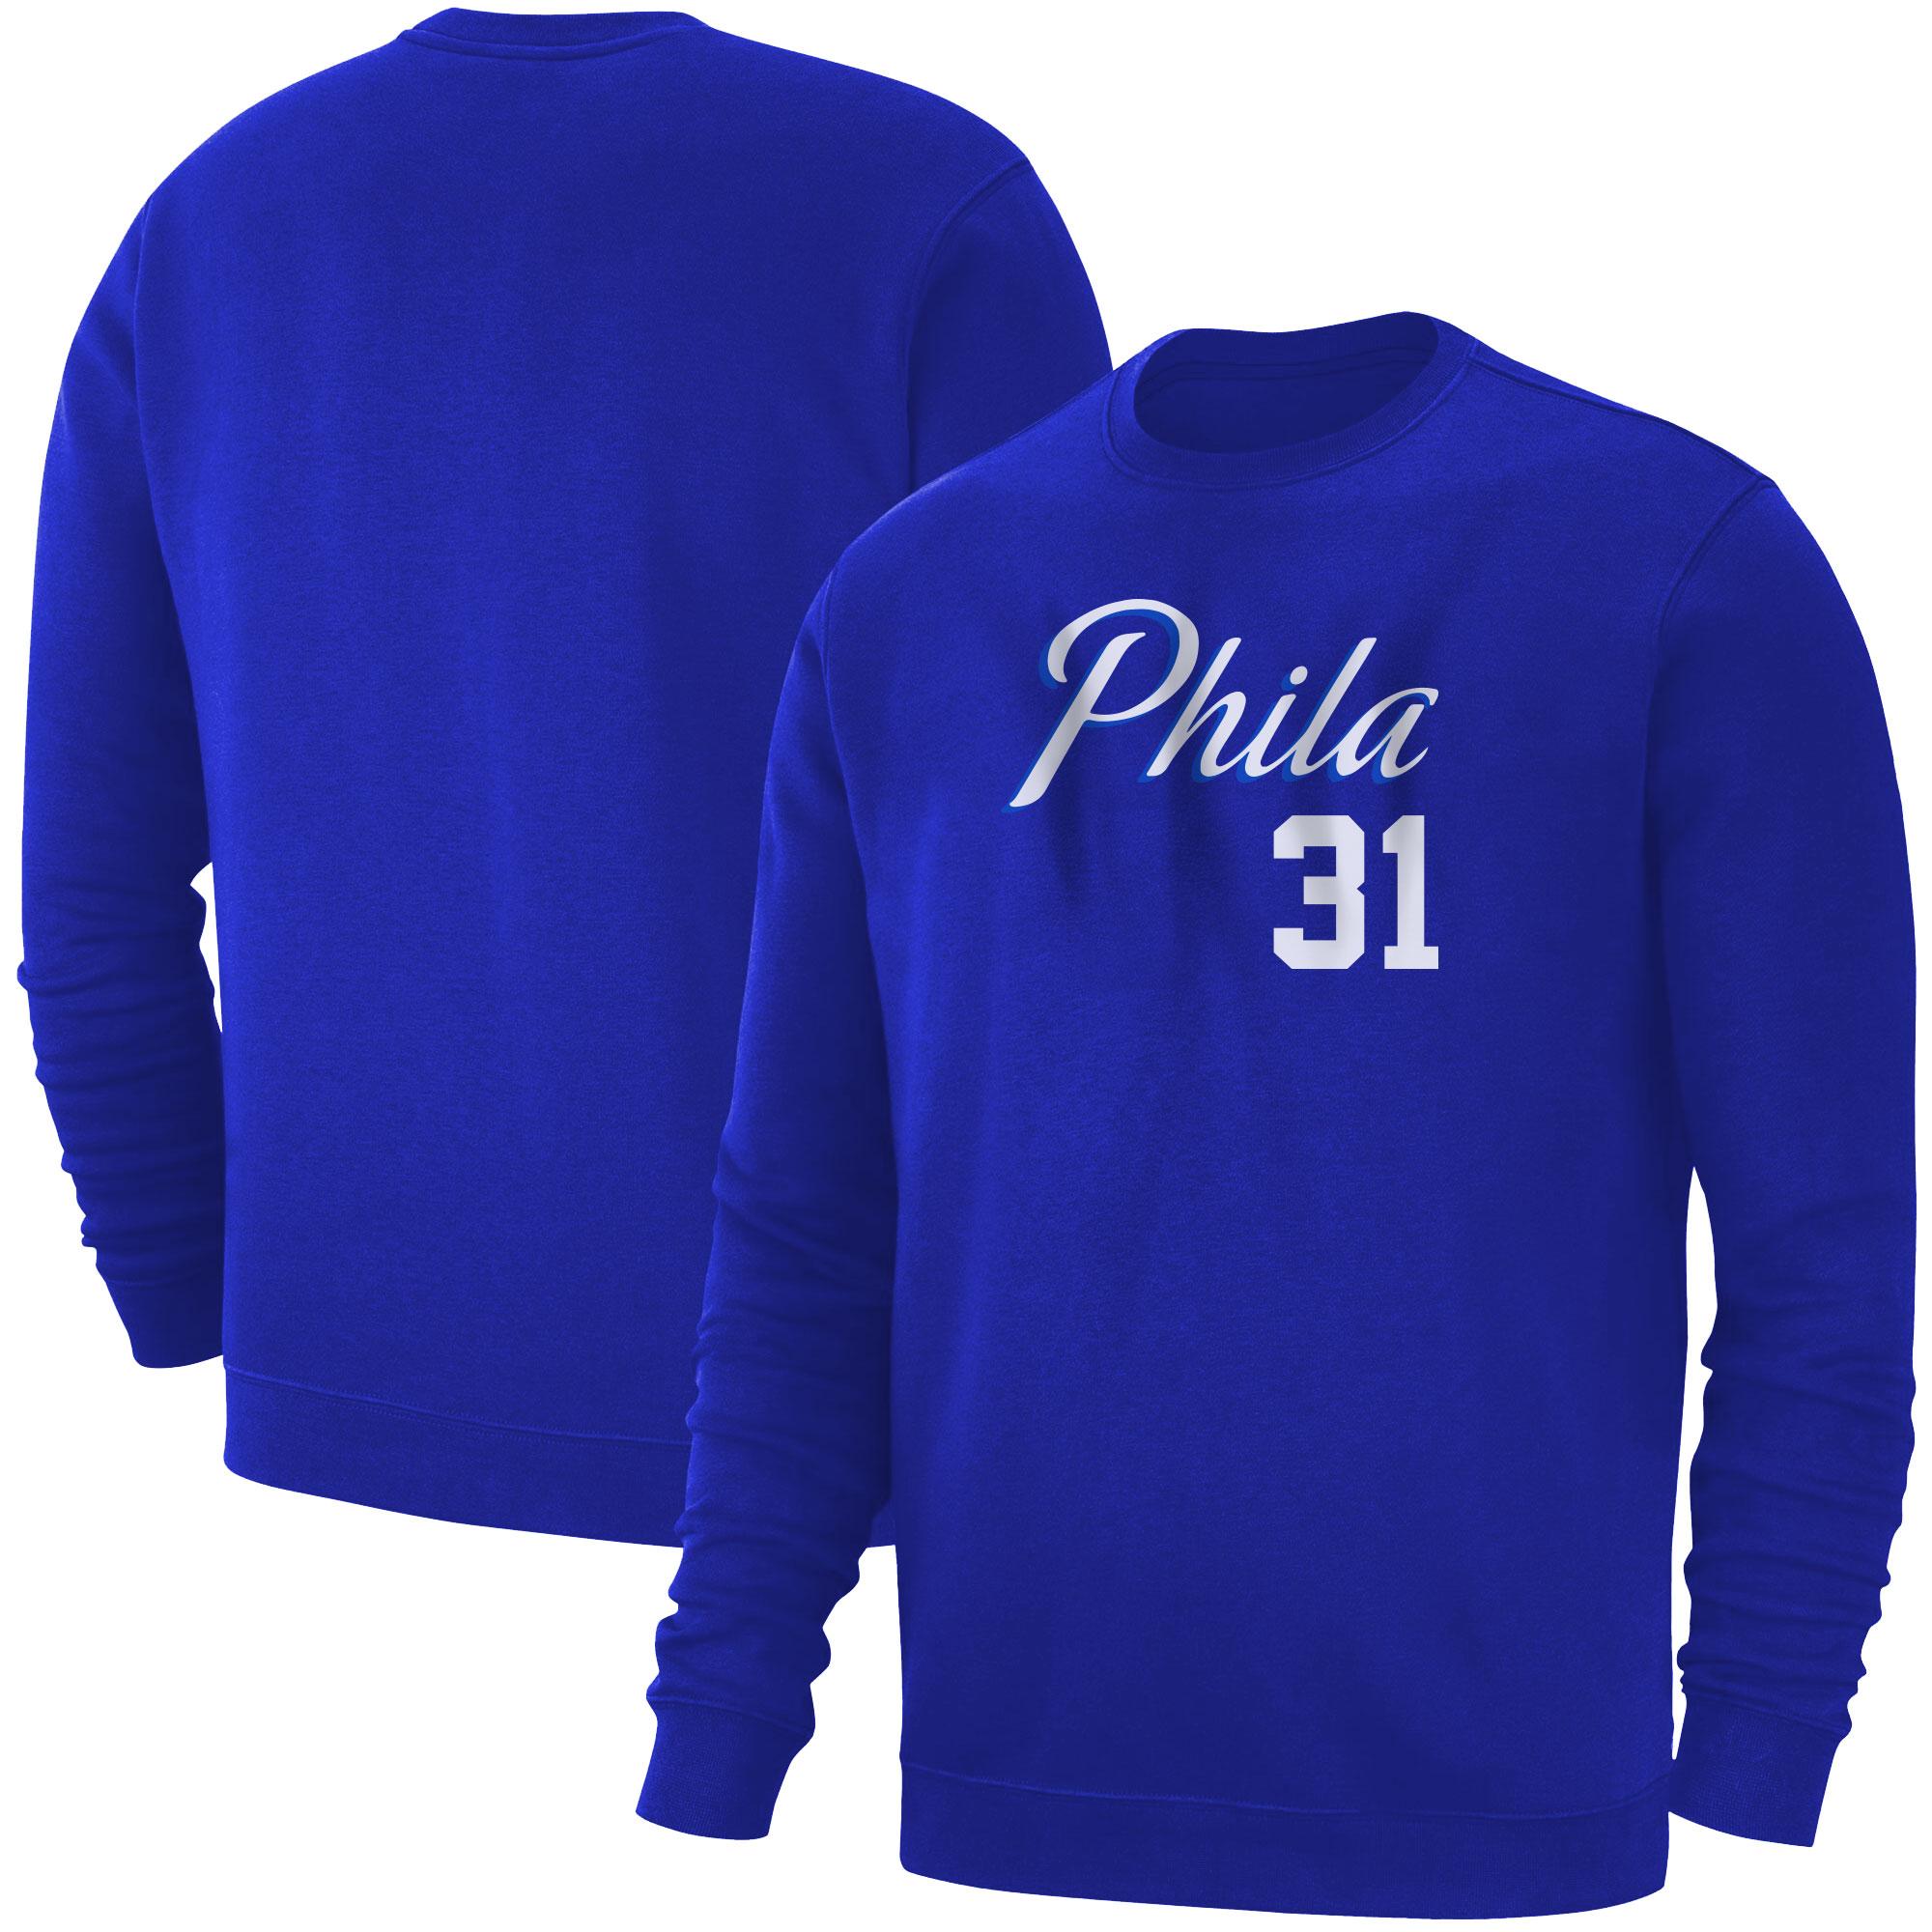 Philadelphia 76ers Seth Curry Basic (BSC-BLU-PLT-504-31)